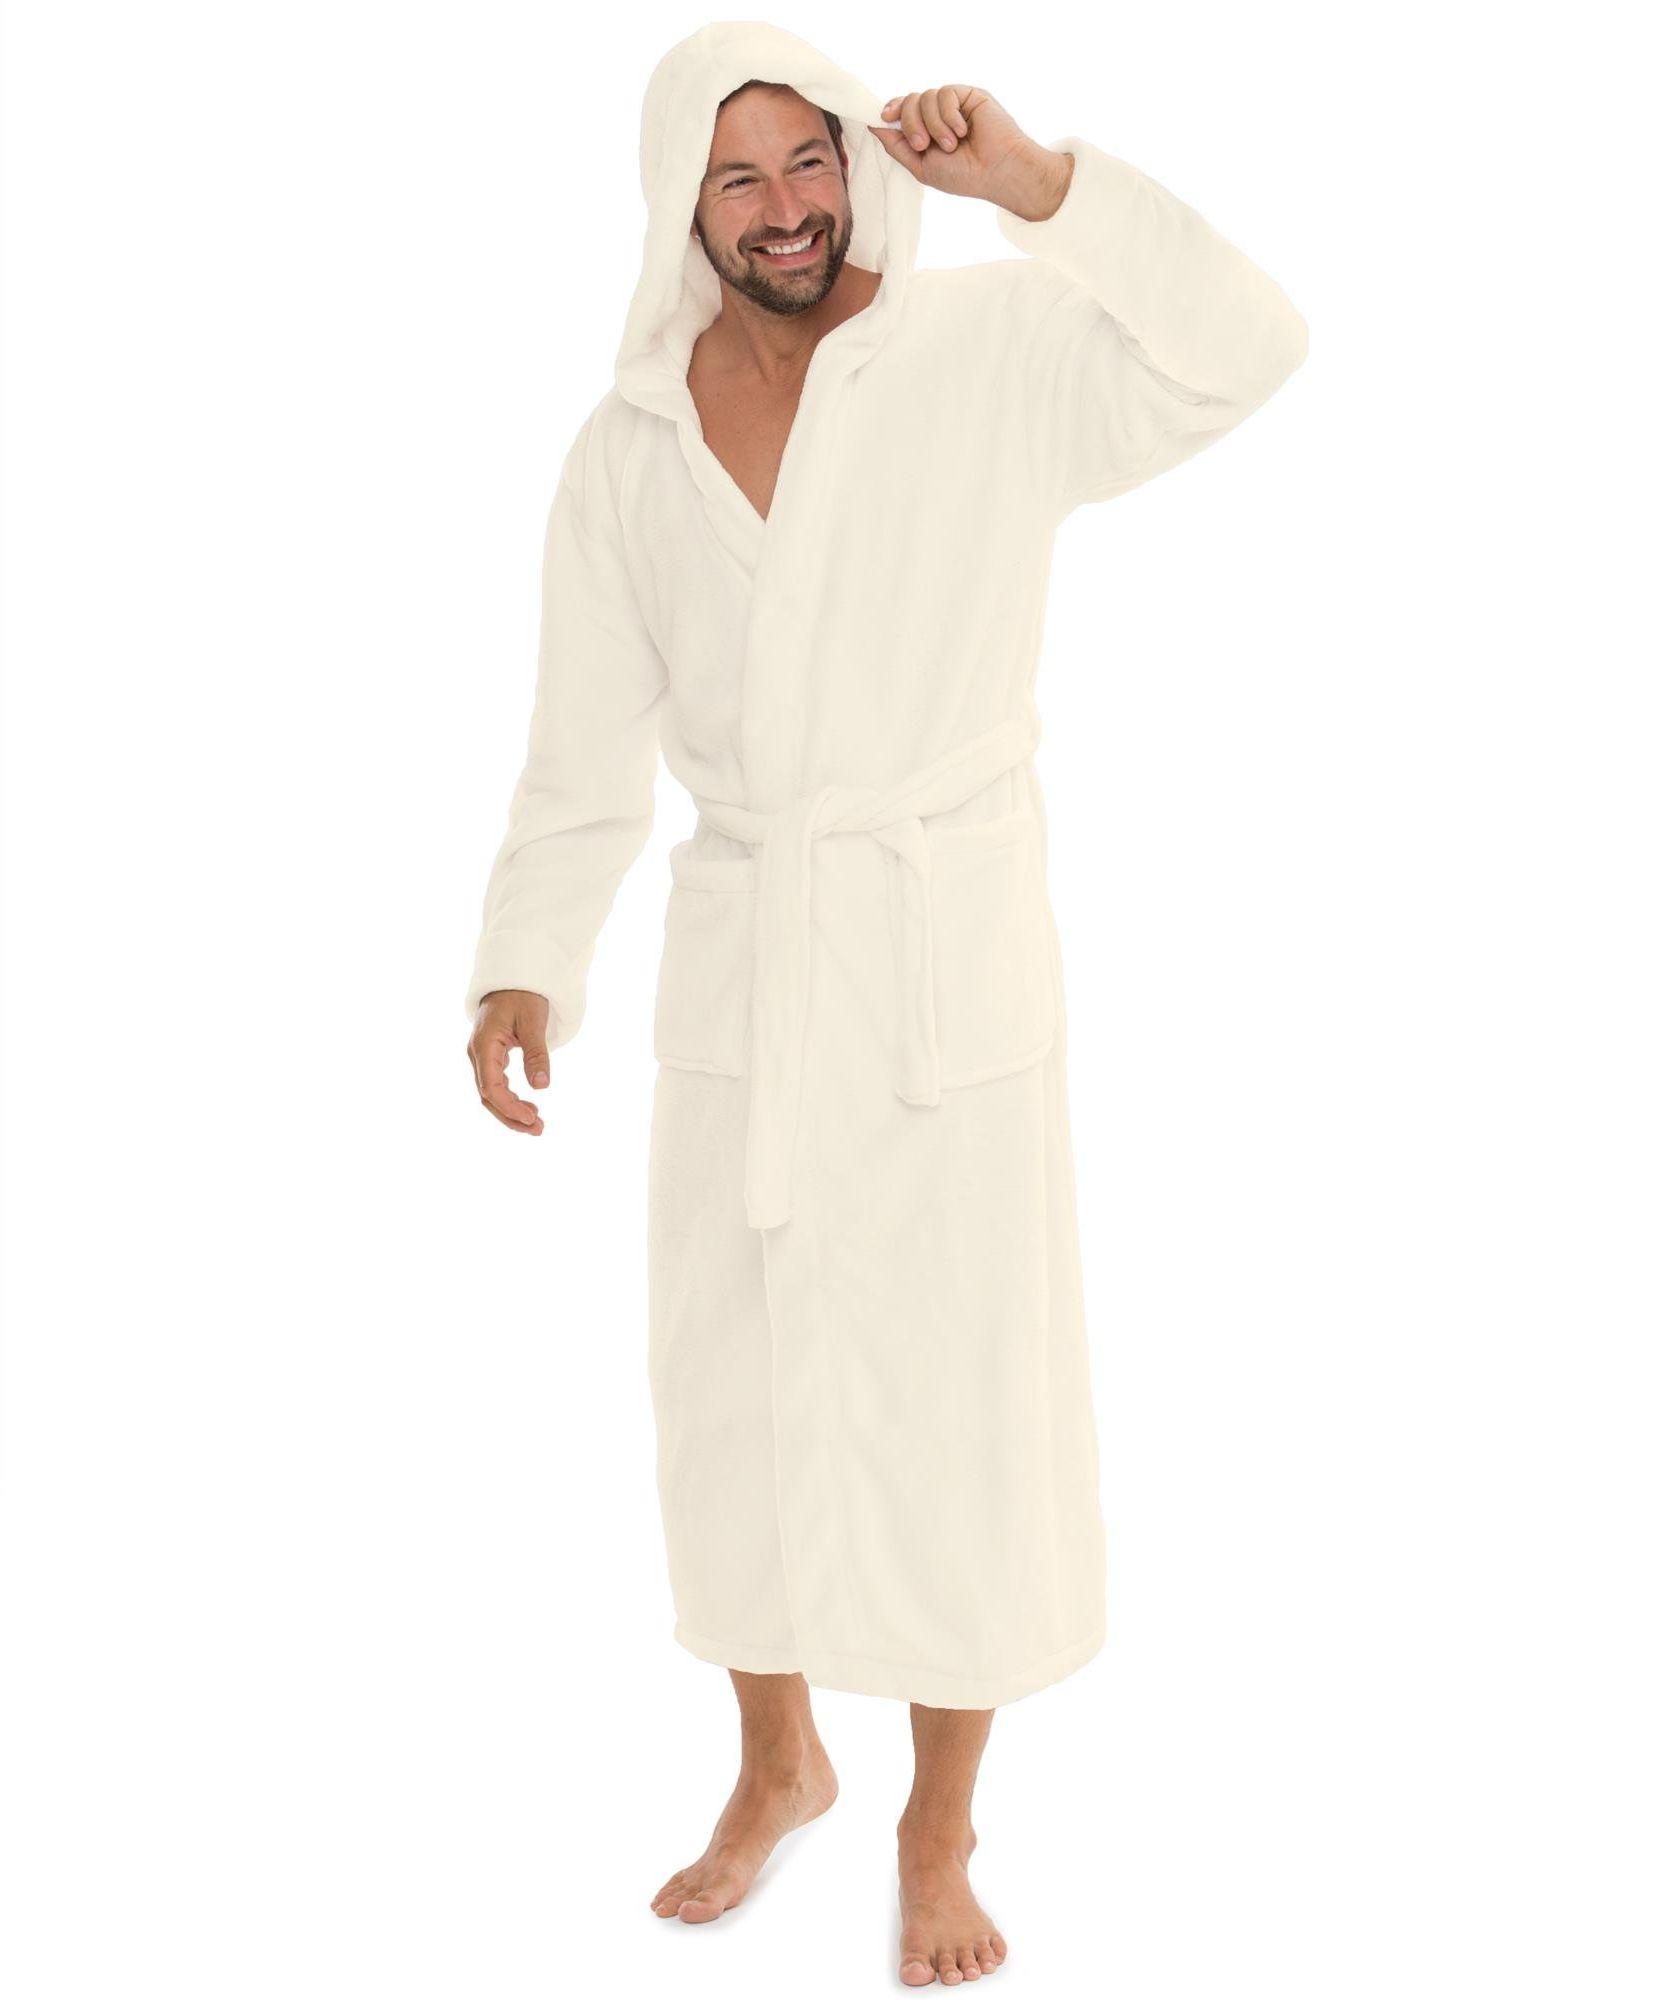 CelinaTex Florida szlafrok damski S kremowy biały szlafrok poranny męski Coral Fleece szlafrok do sauny z mikrofibry kaptur unisex